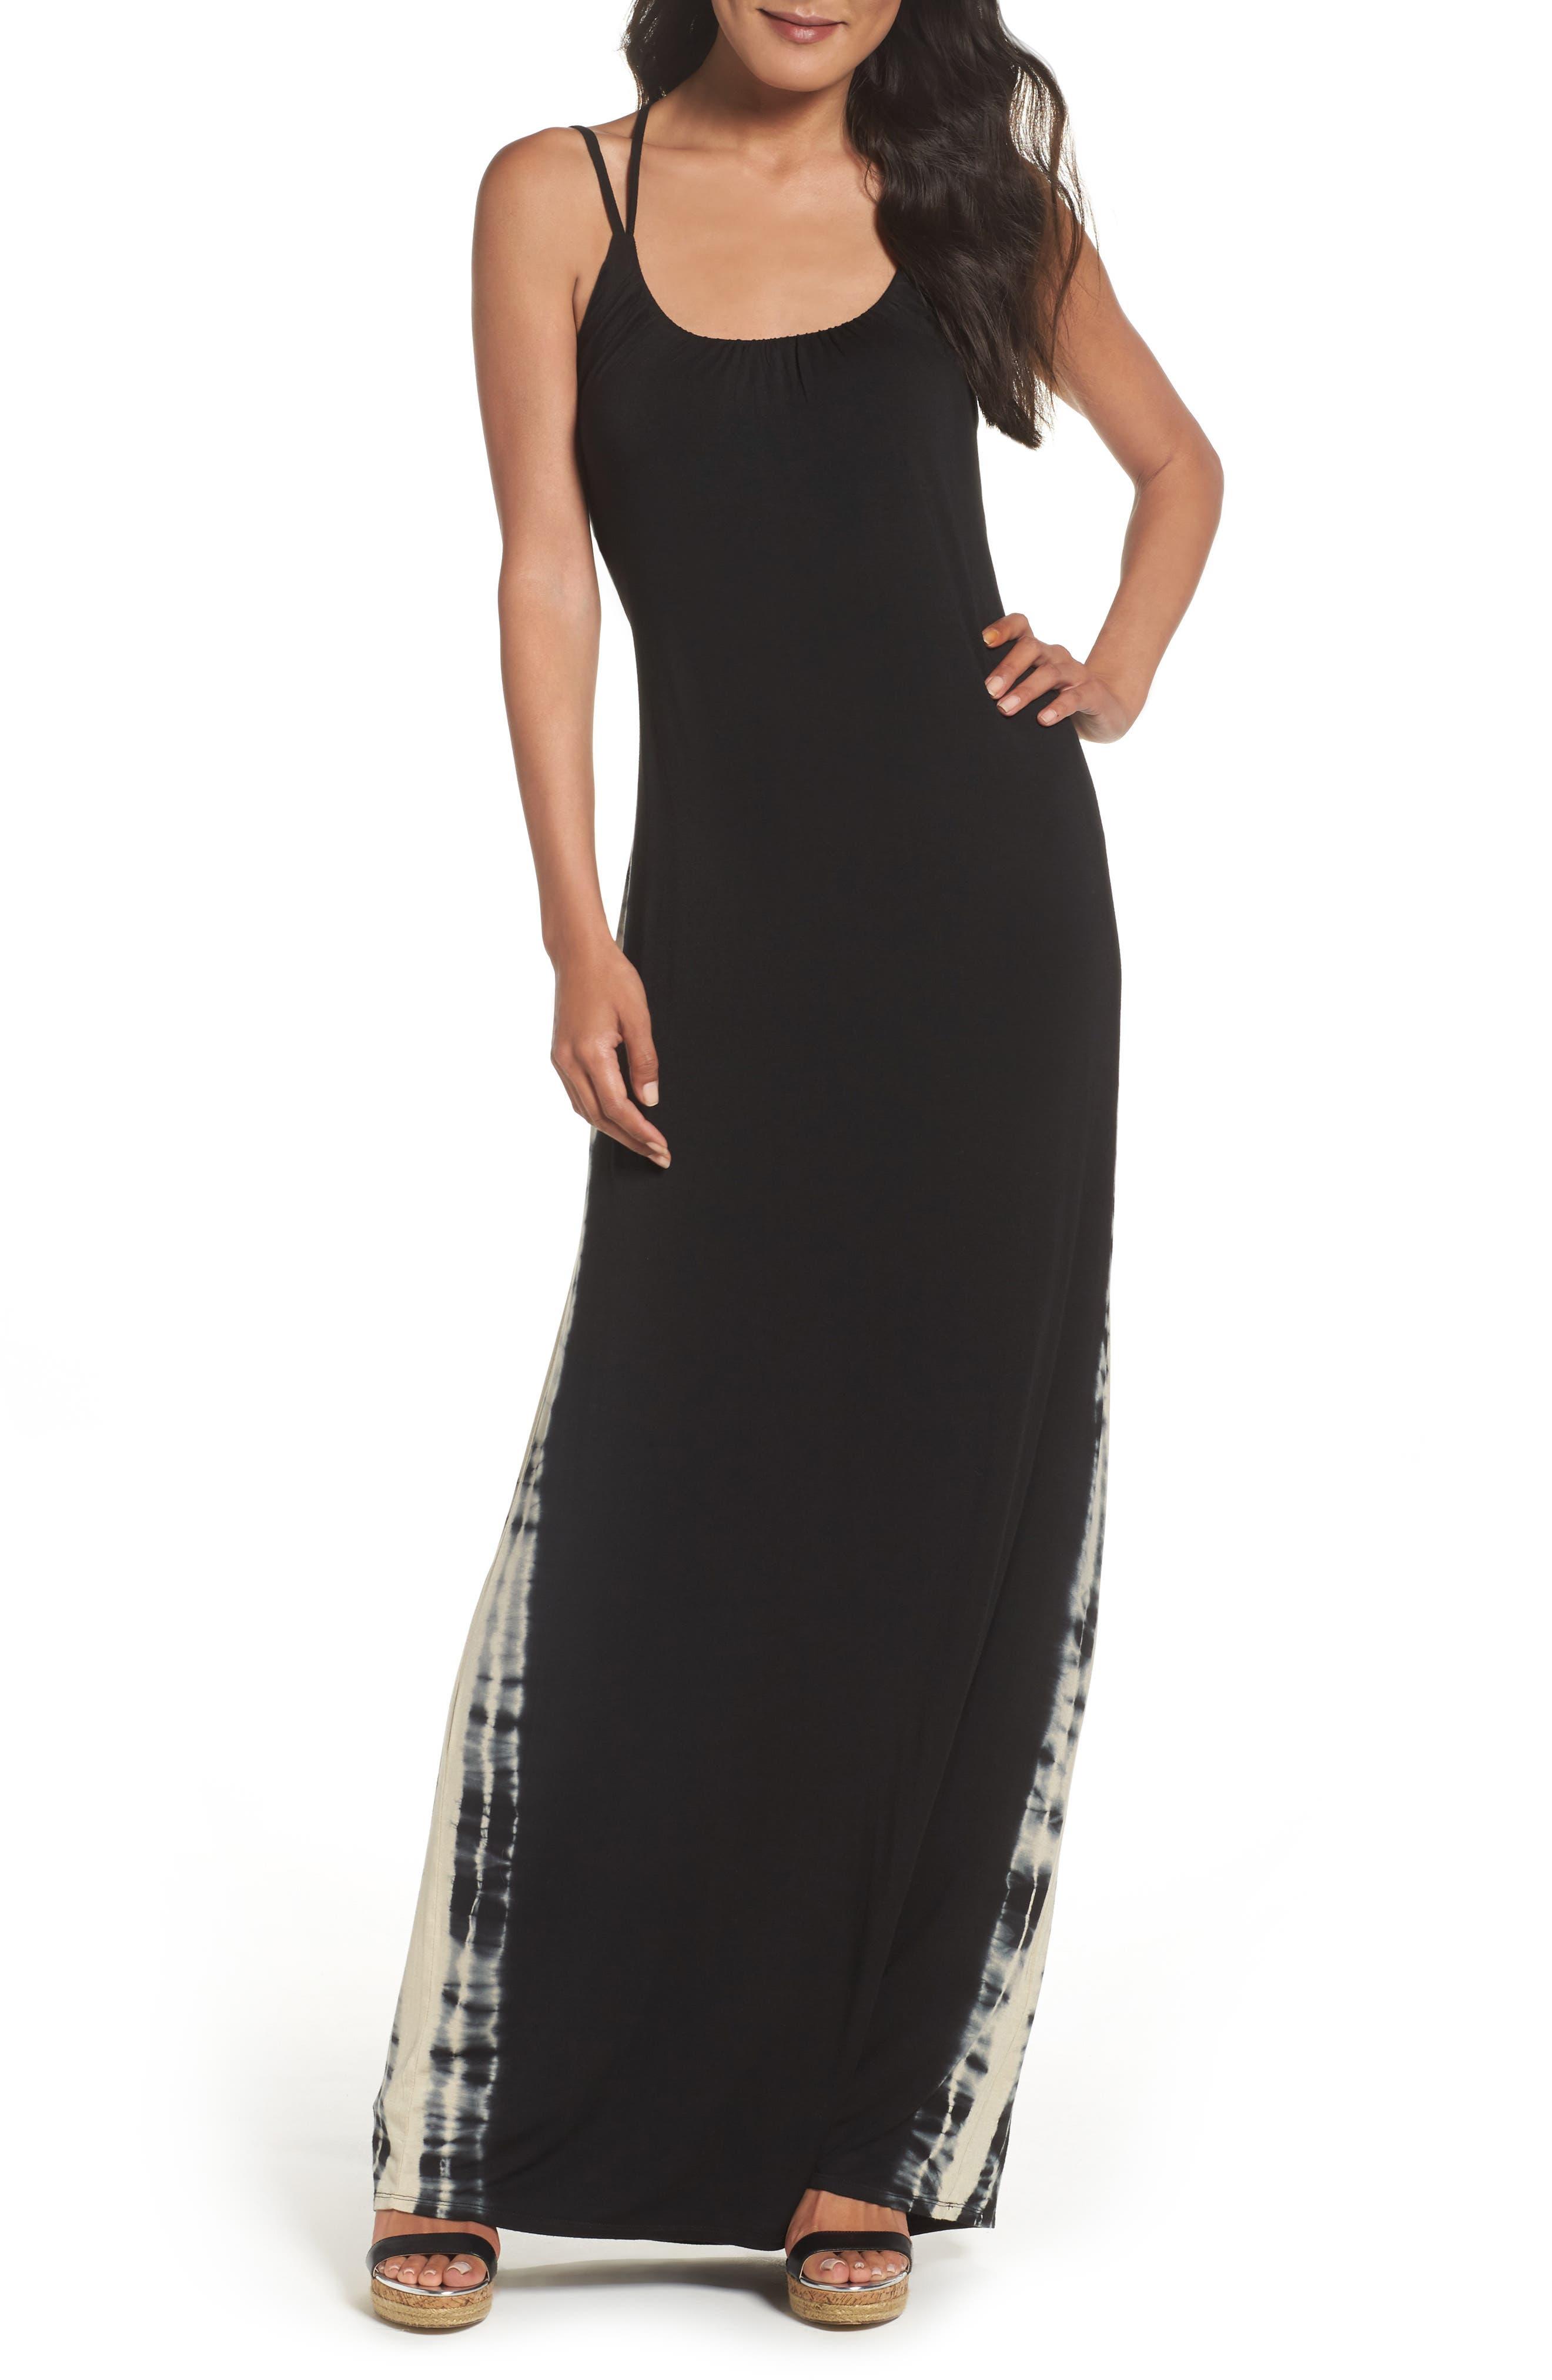 FELICITY & COCO Tie Dye Maxi Dress